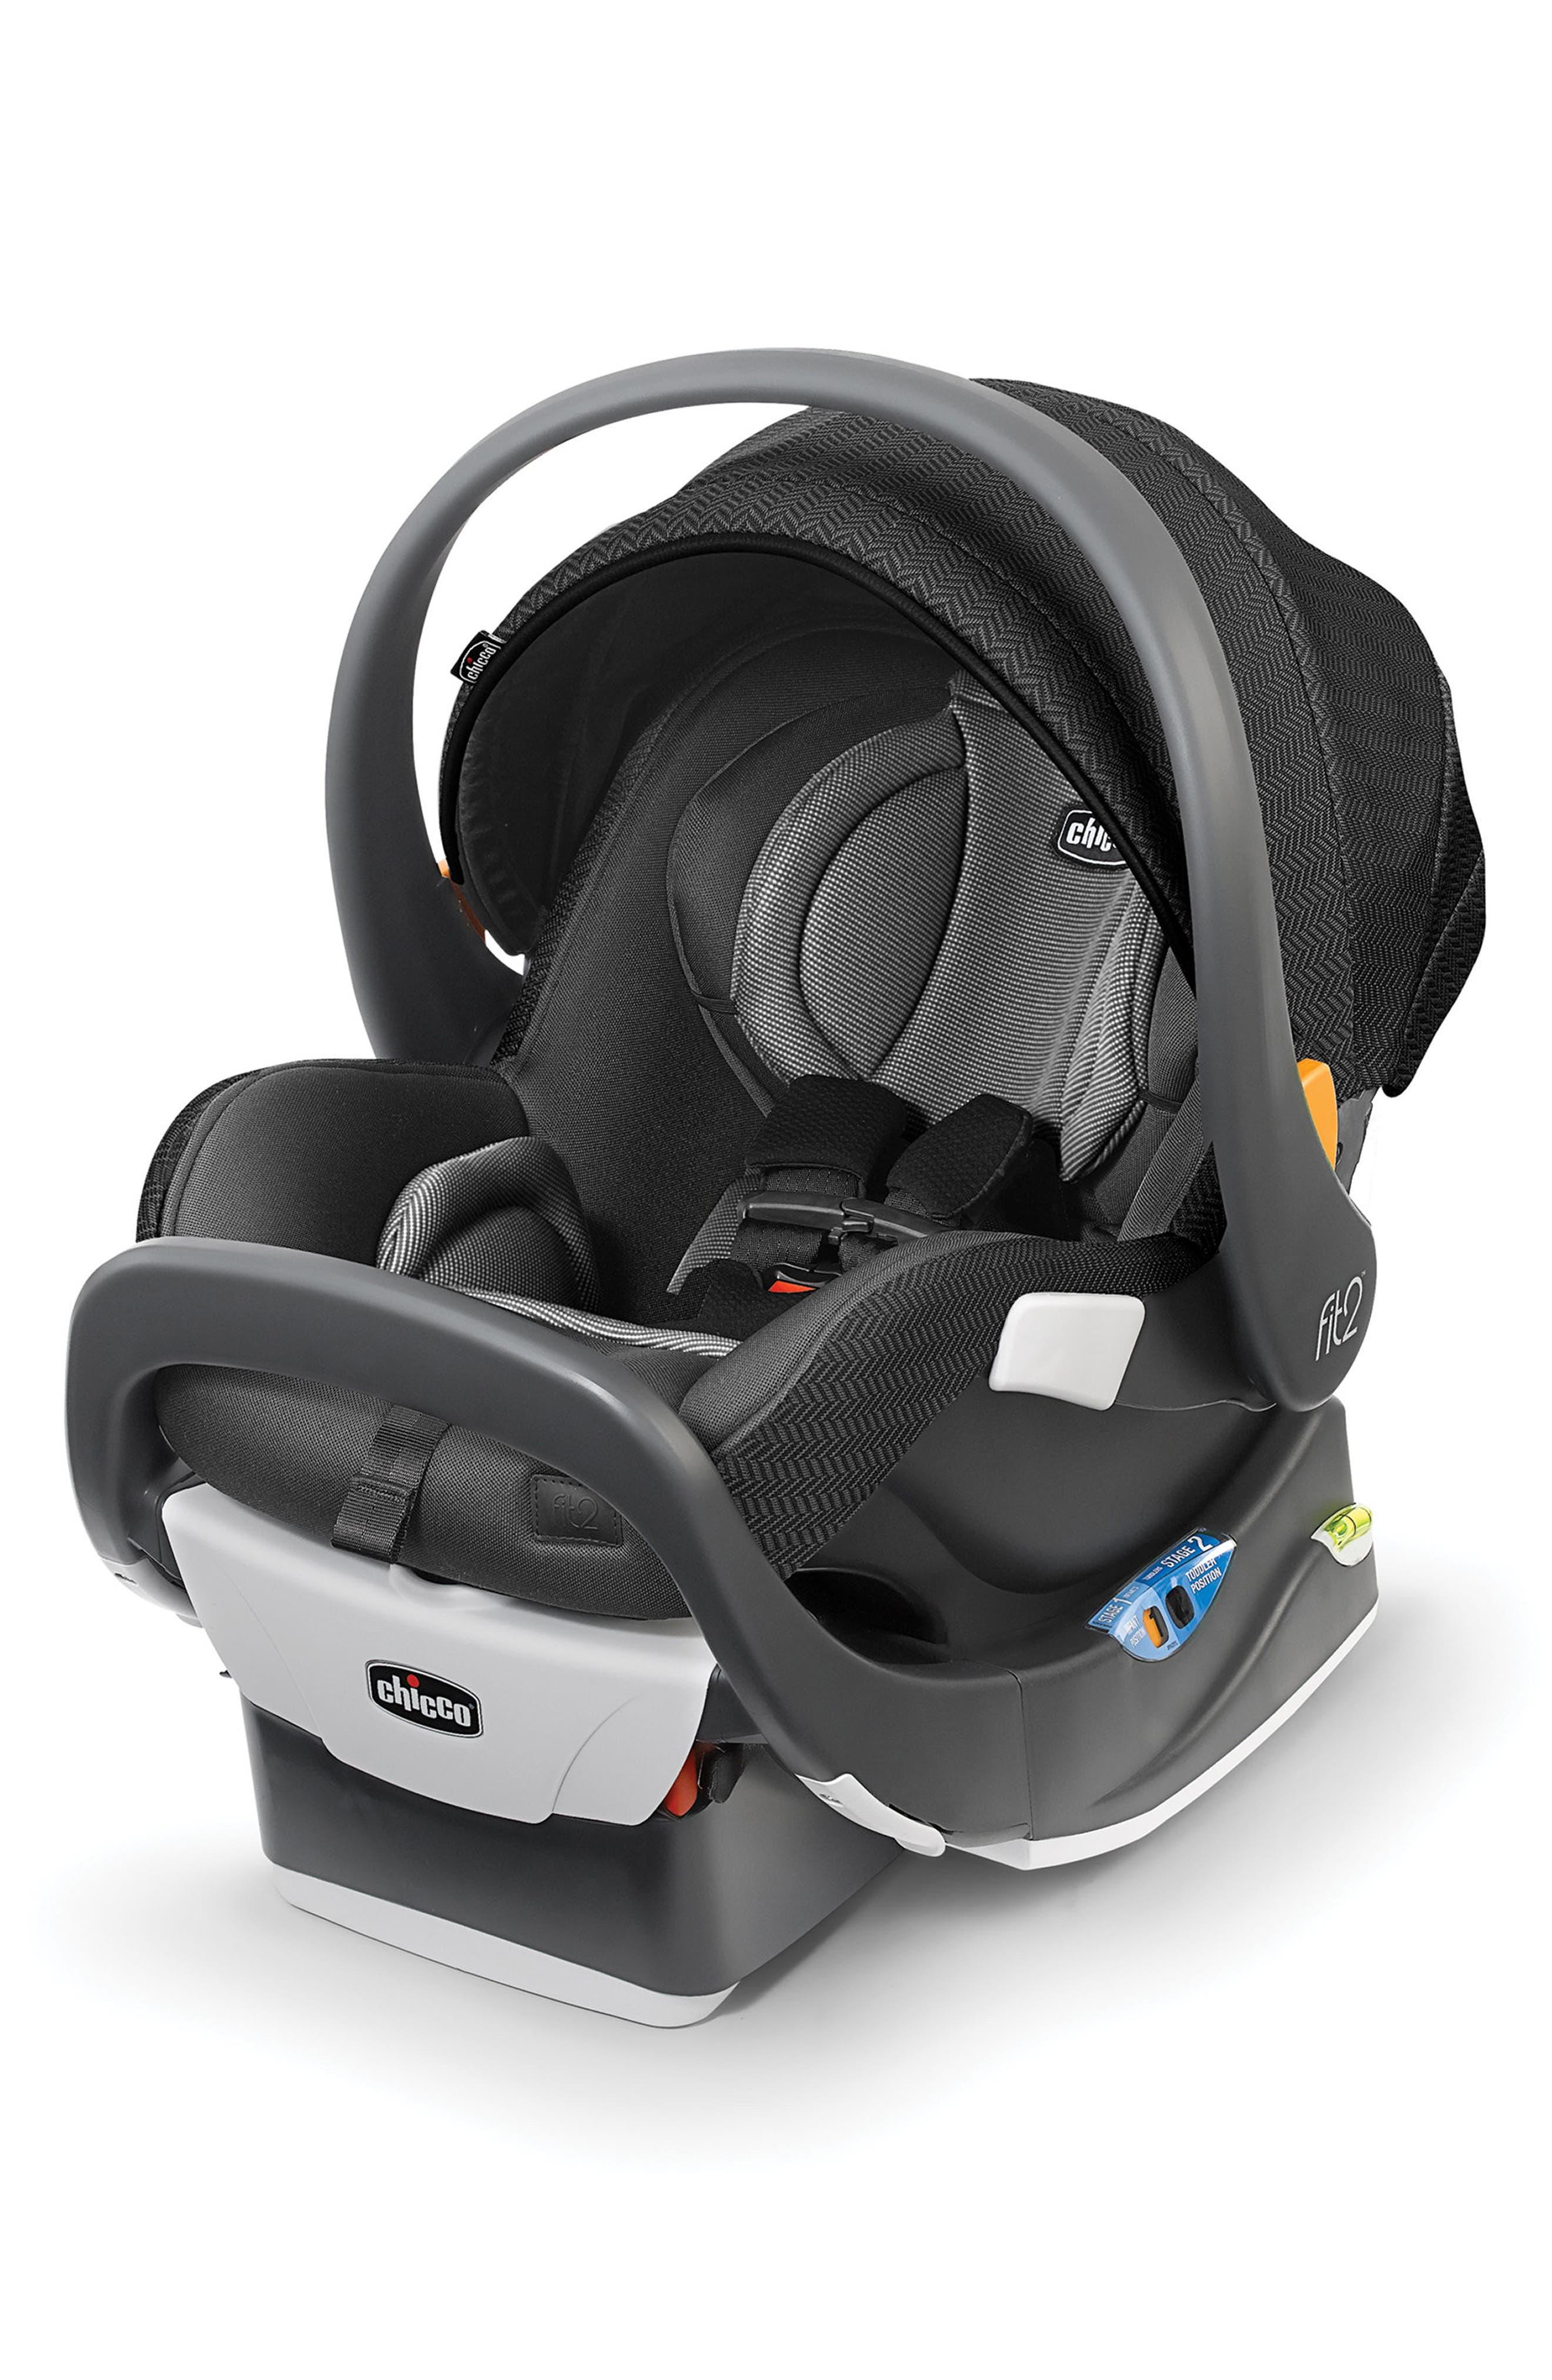 Fit2 2018 Rear-Facing Infant & Toddler Car Seat,                         Main,                         color, 001